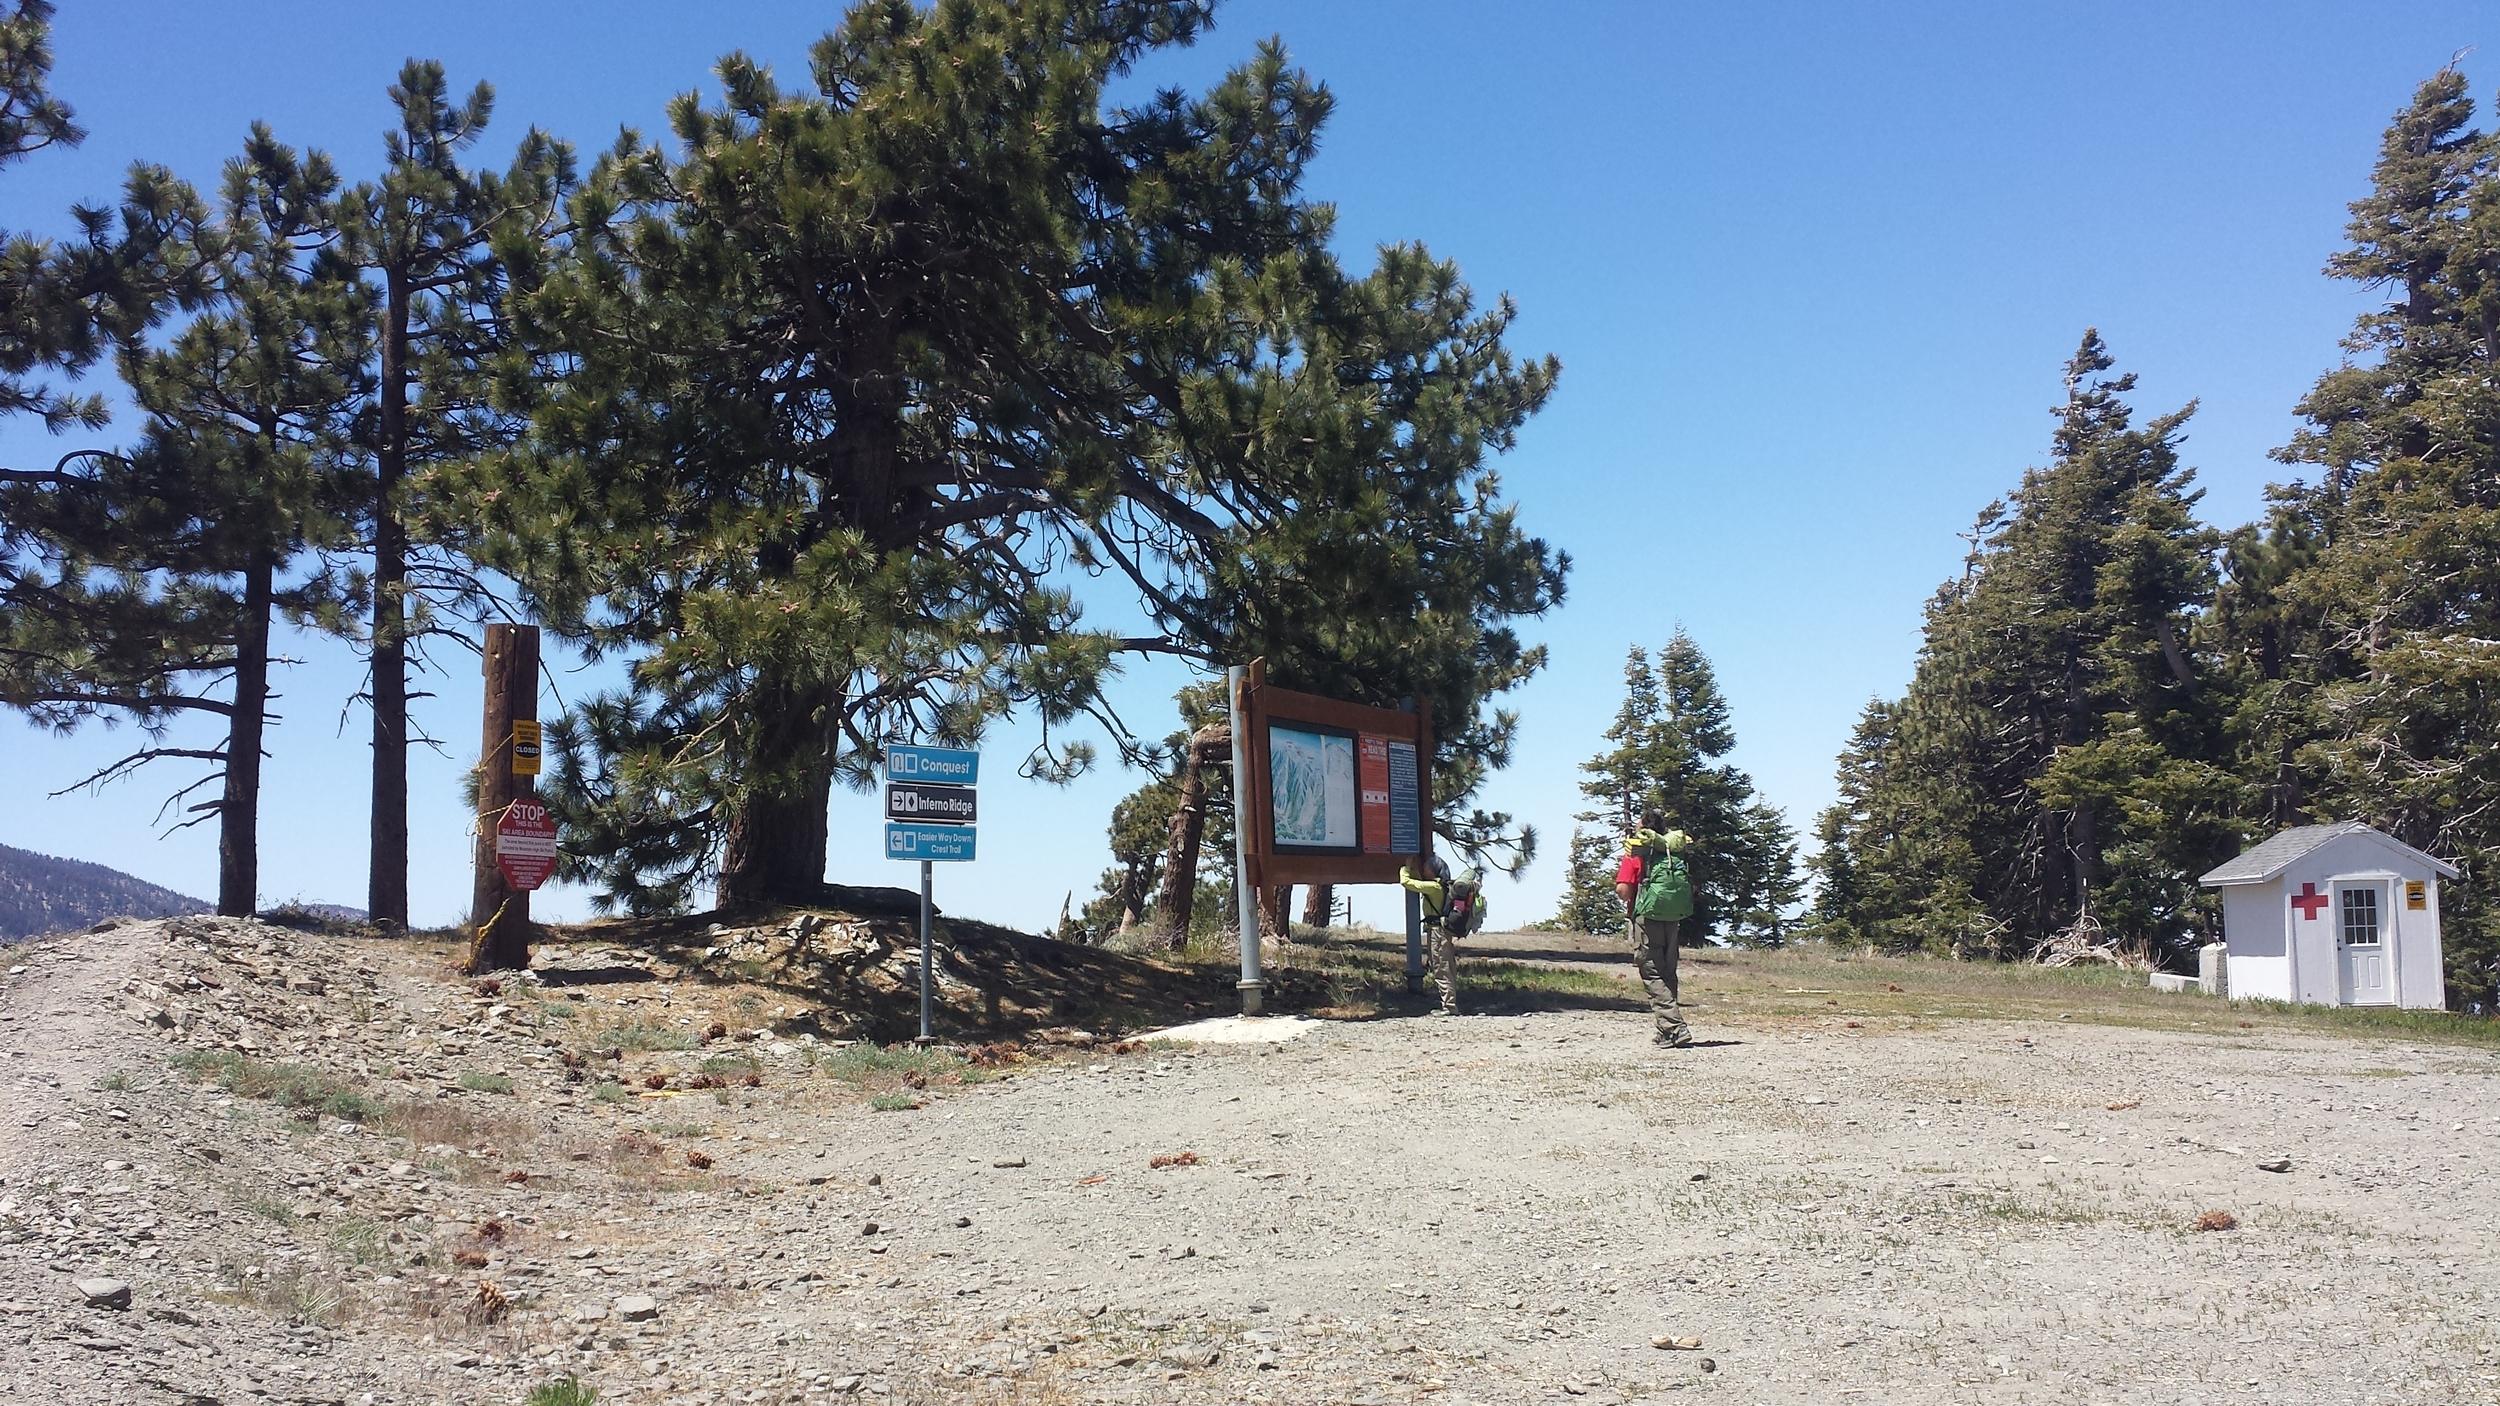 Abandoned ski resort.